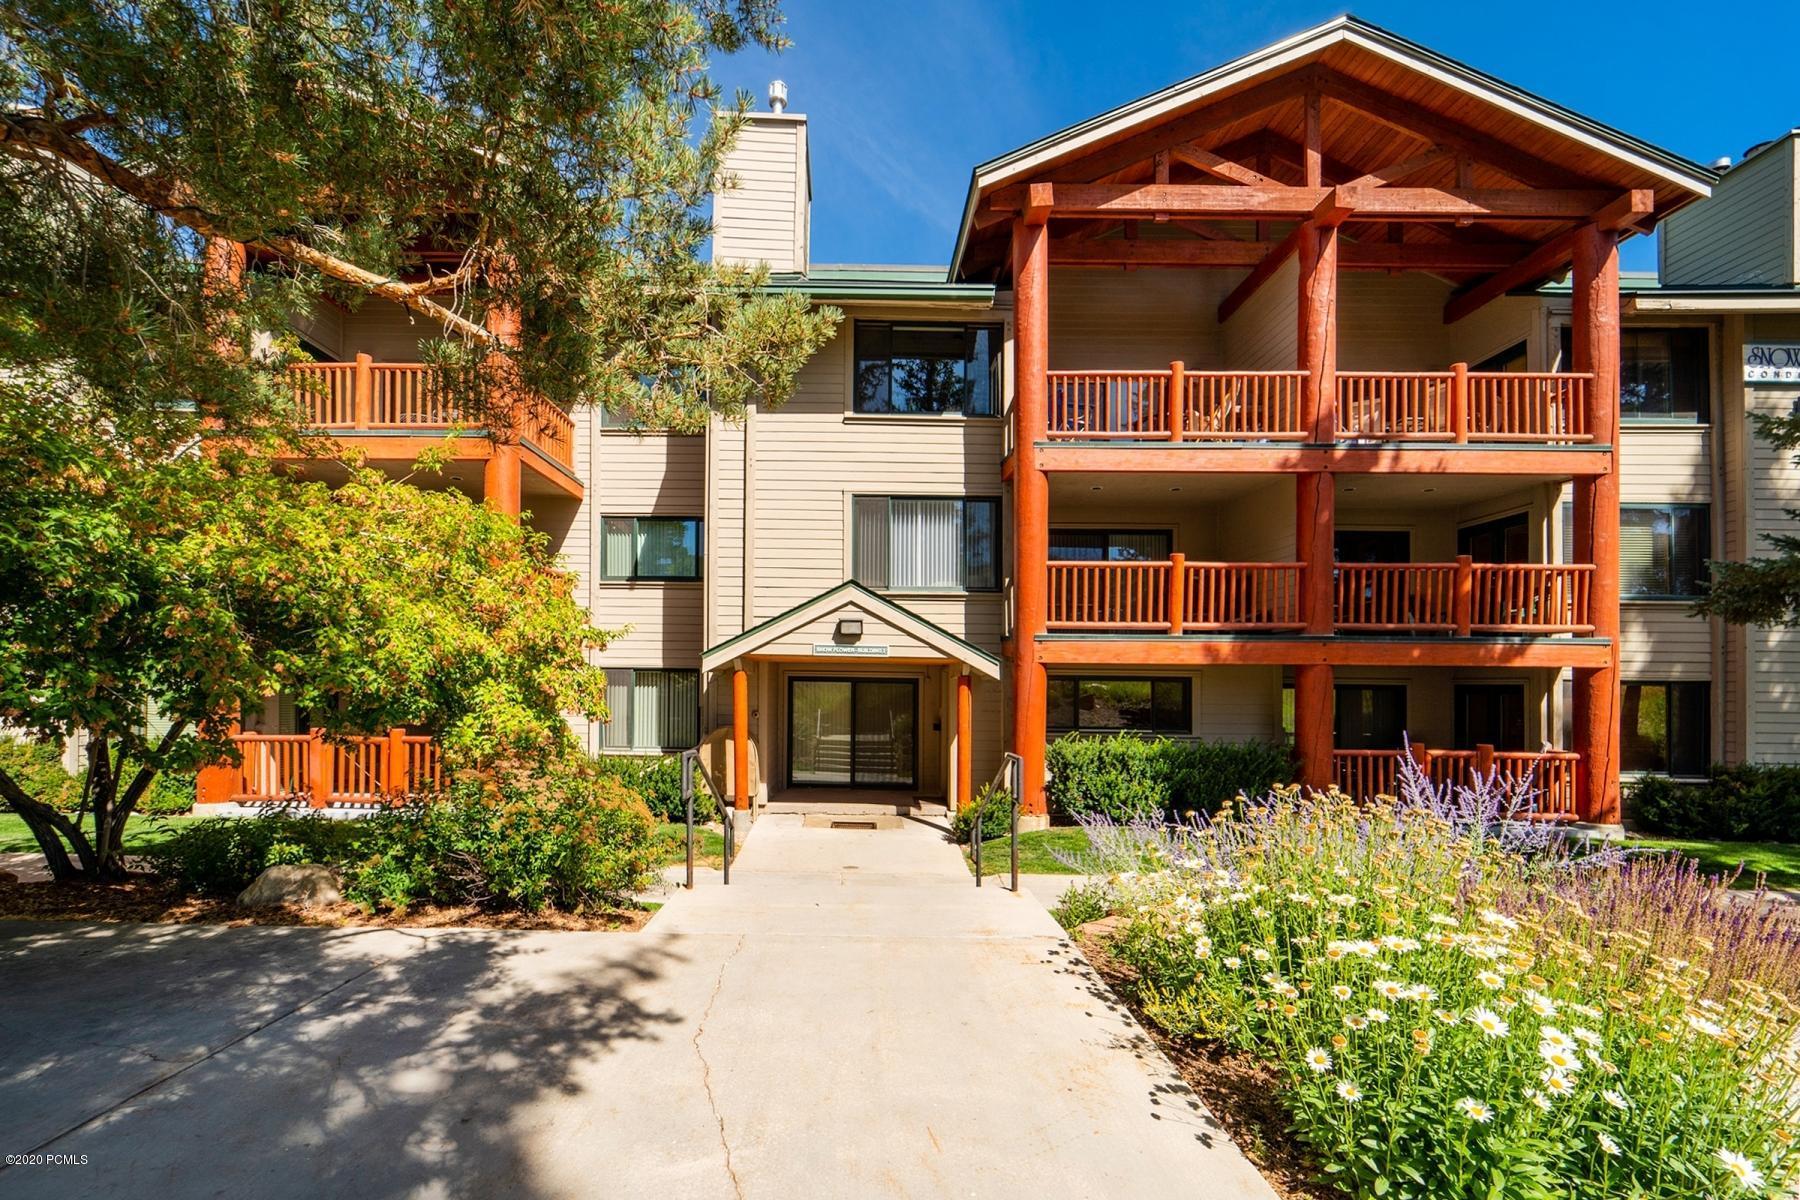 401 Silver King Drive, Park City, Utah 84060, 2 Bedrooms Bedrooms, ,2 BathroomsBathrooms,Condominium,For Sale,Silver King,12003407